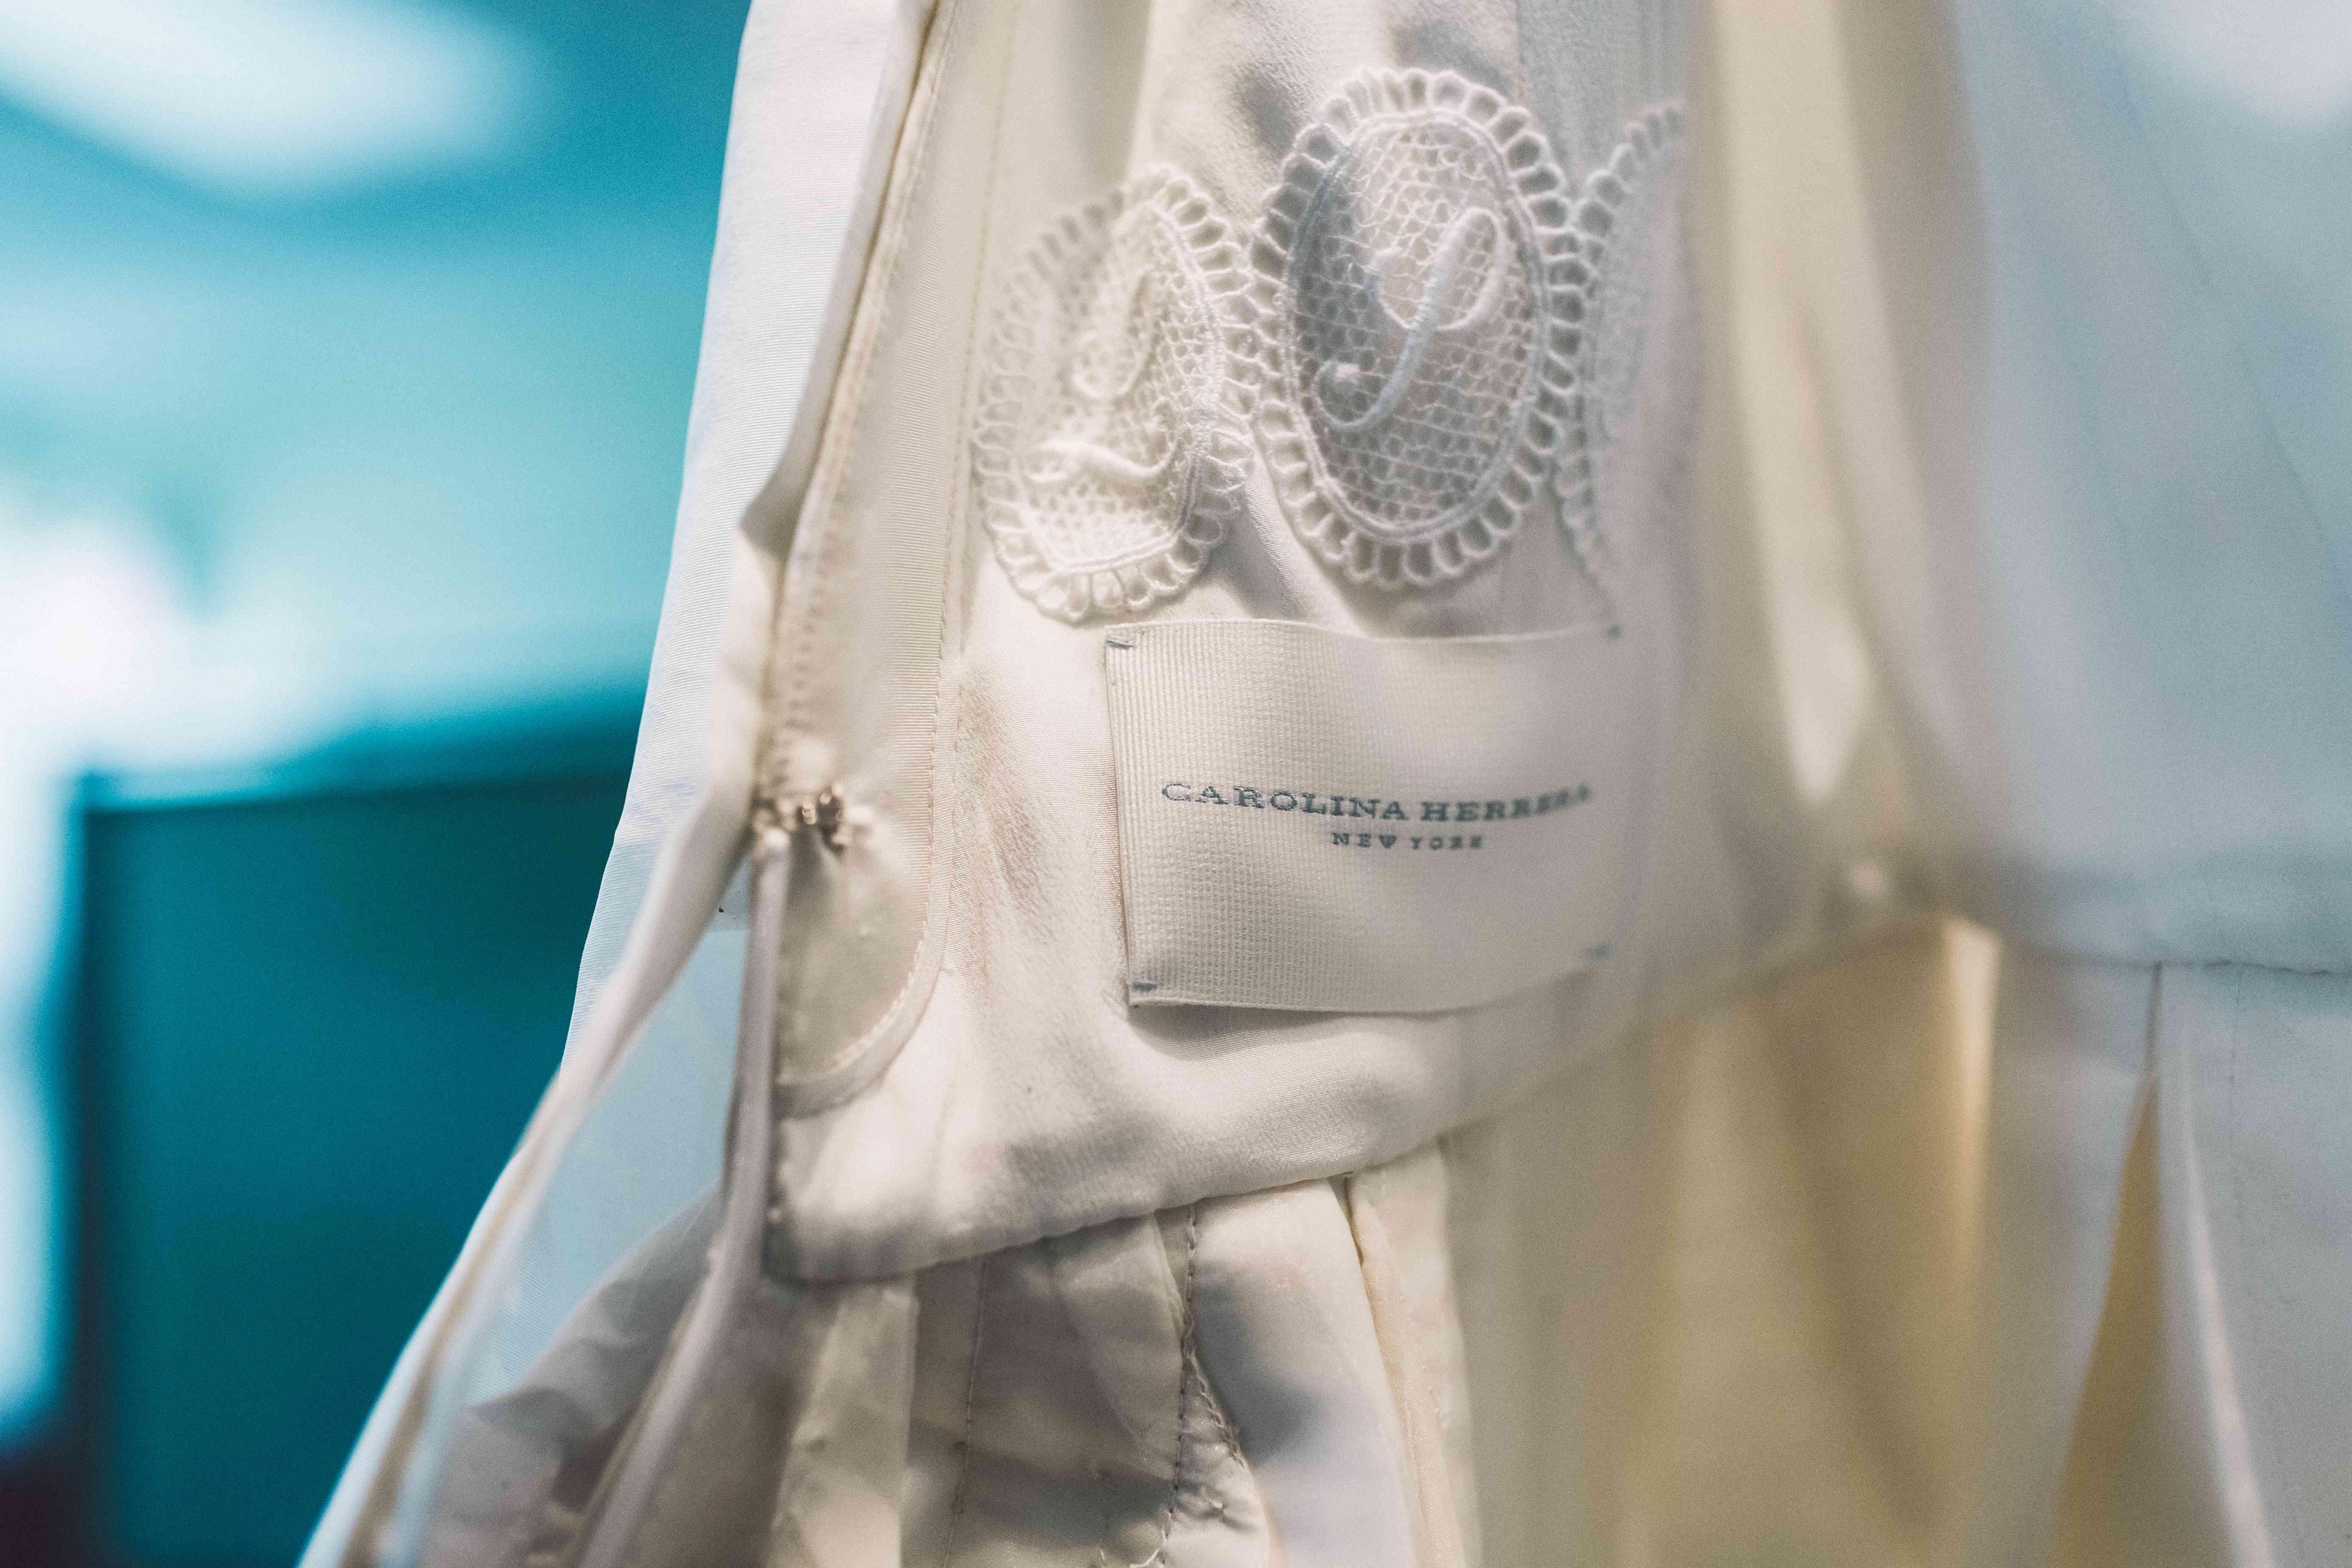 Carolina Herrera Wedding Dress with Monogram